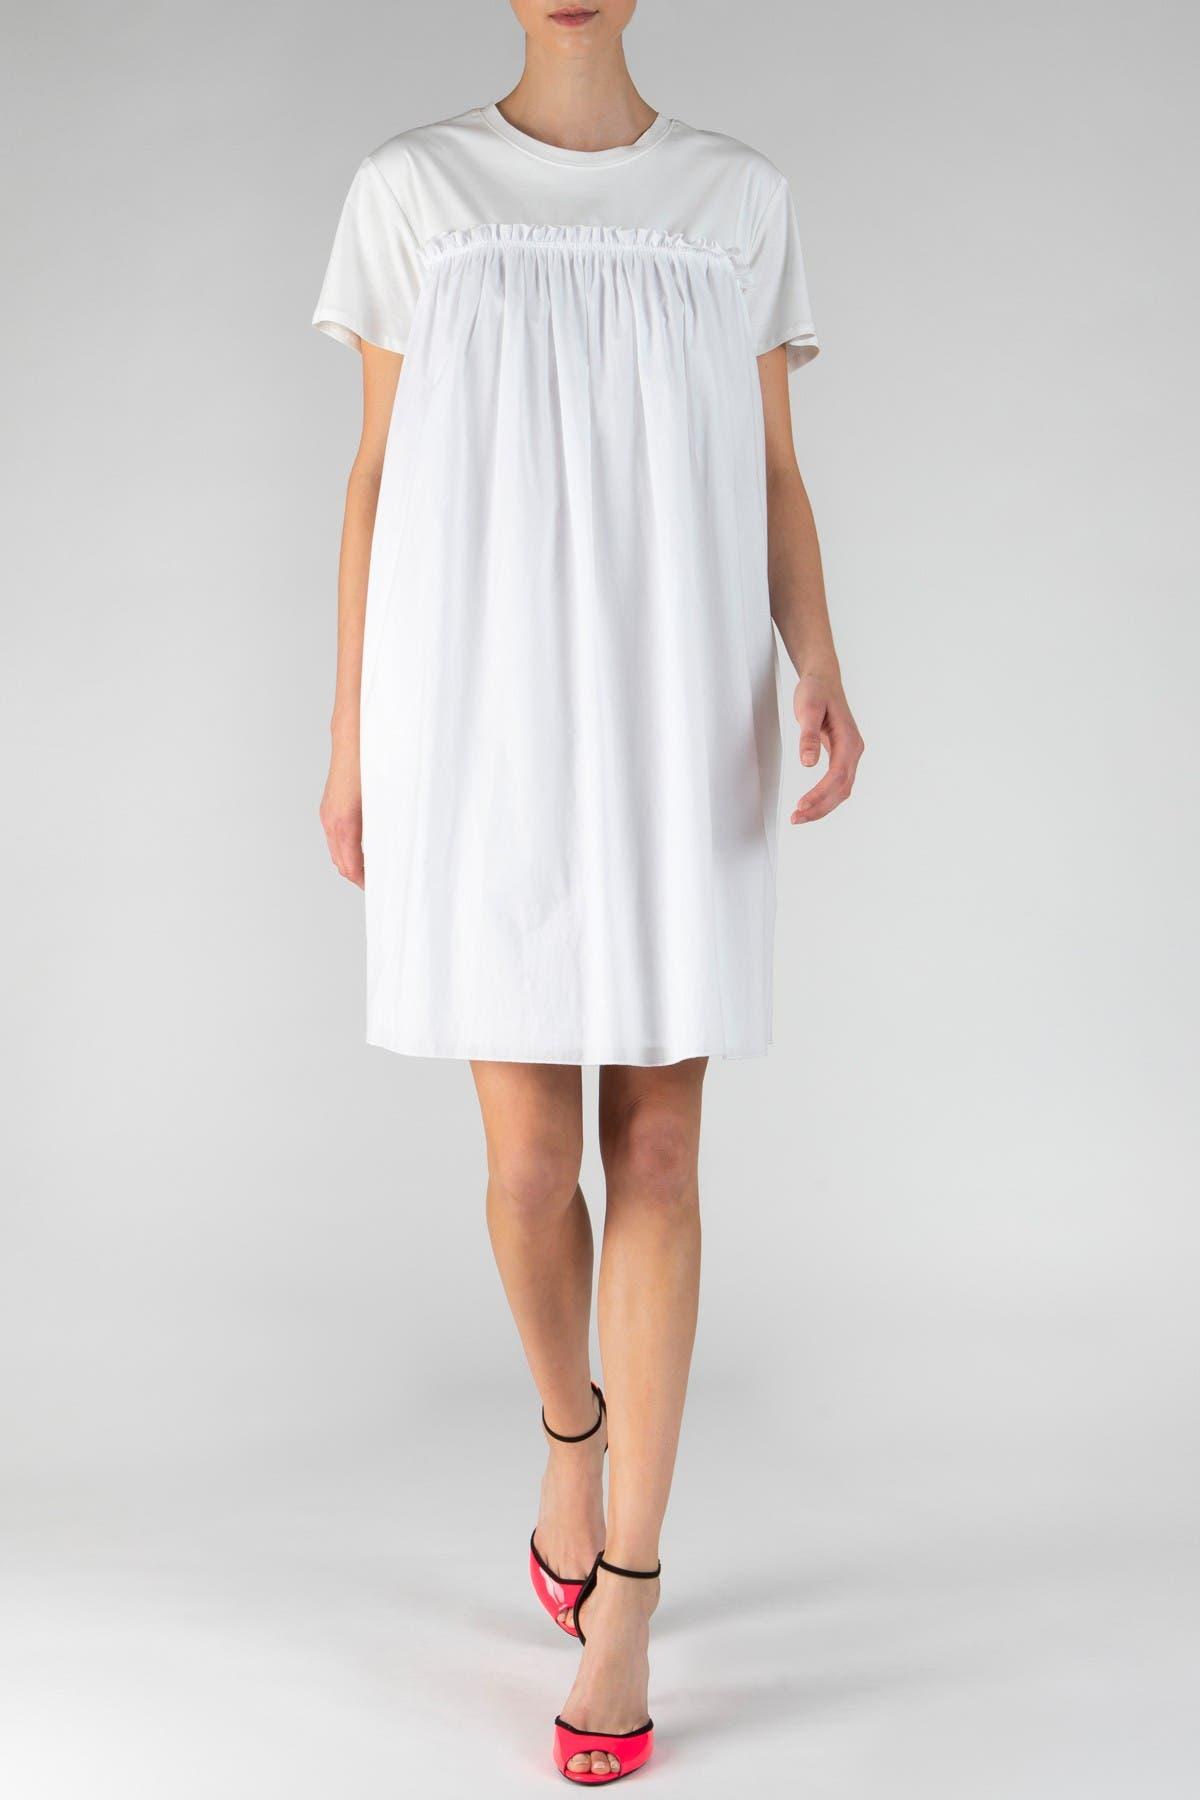 Atm Anthony Thomas Melillo Mix Media Short Sleeve Dress In White